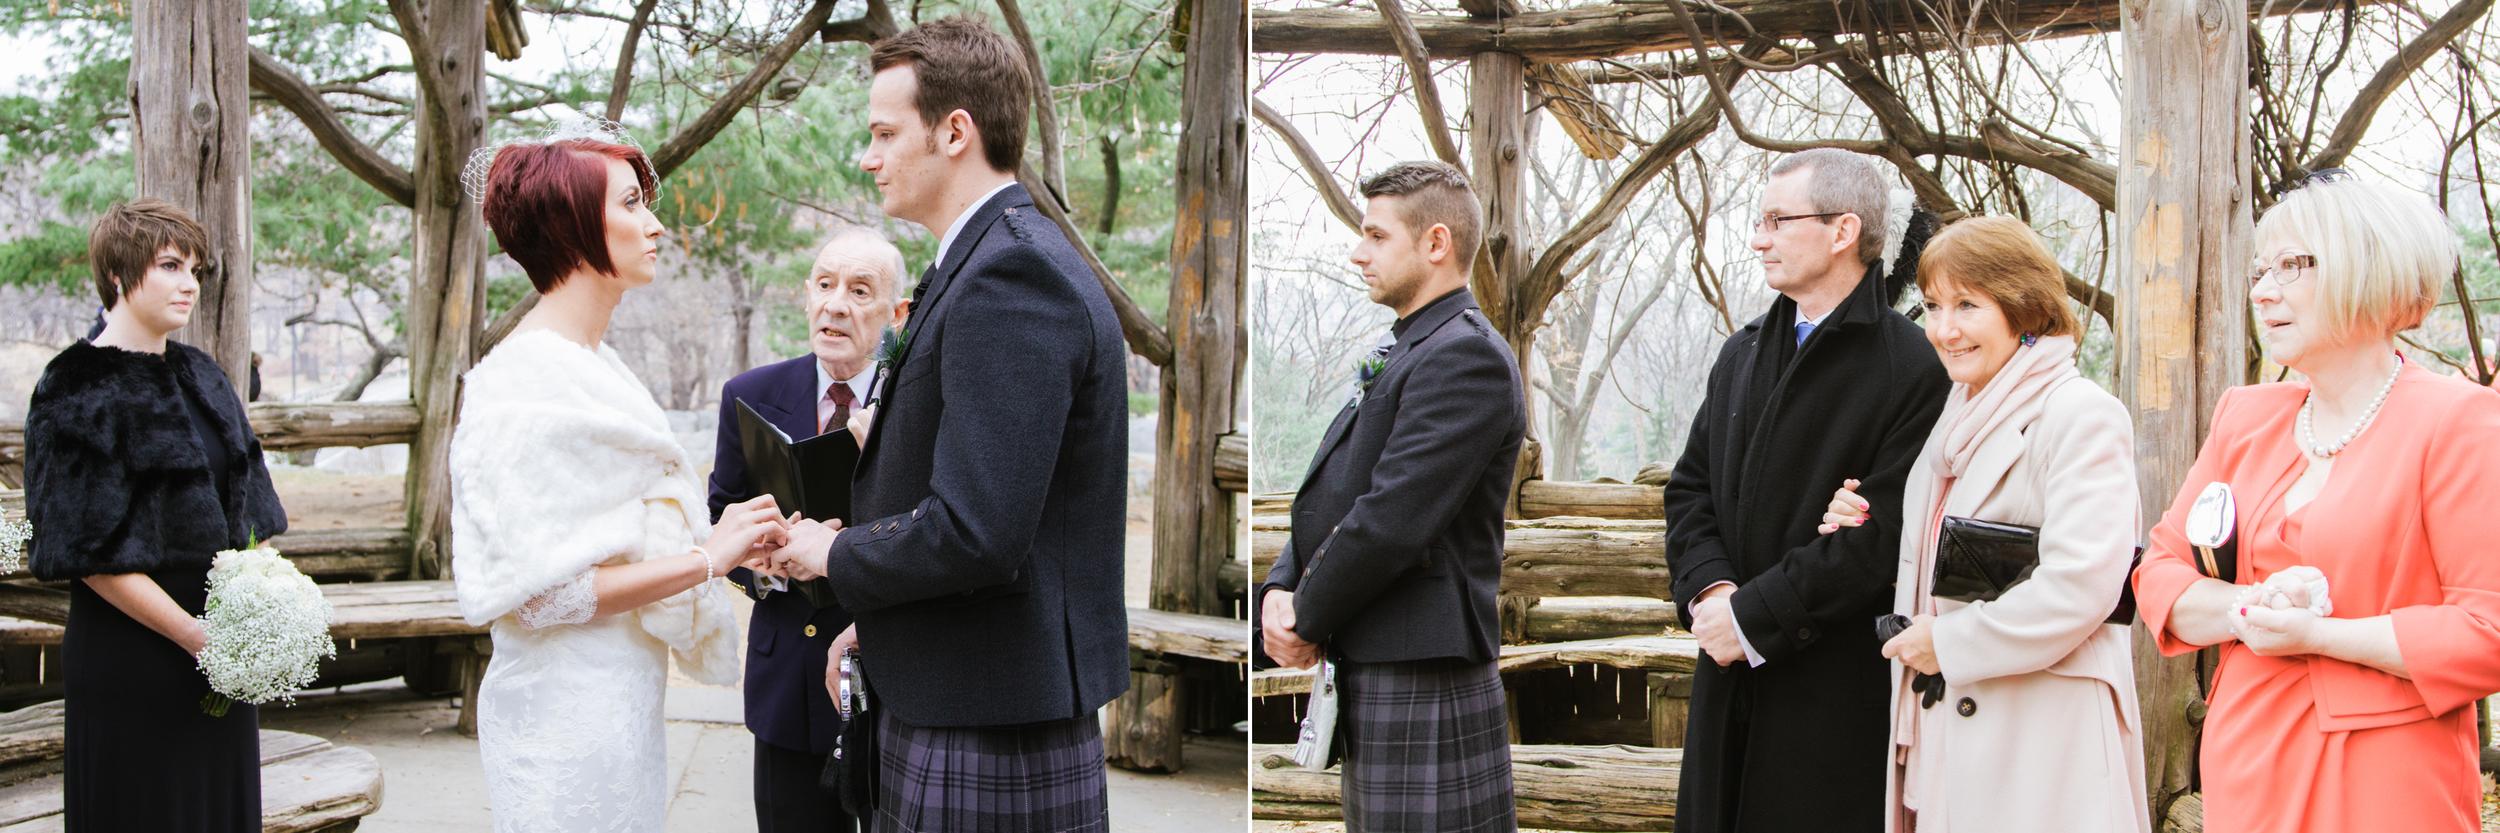 L&J_copcot_centralpark_intimate-wedding_5.jpg